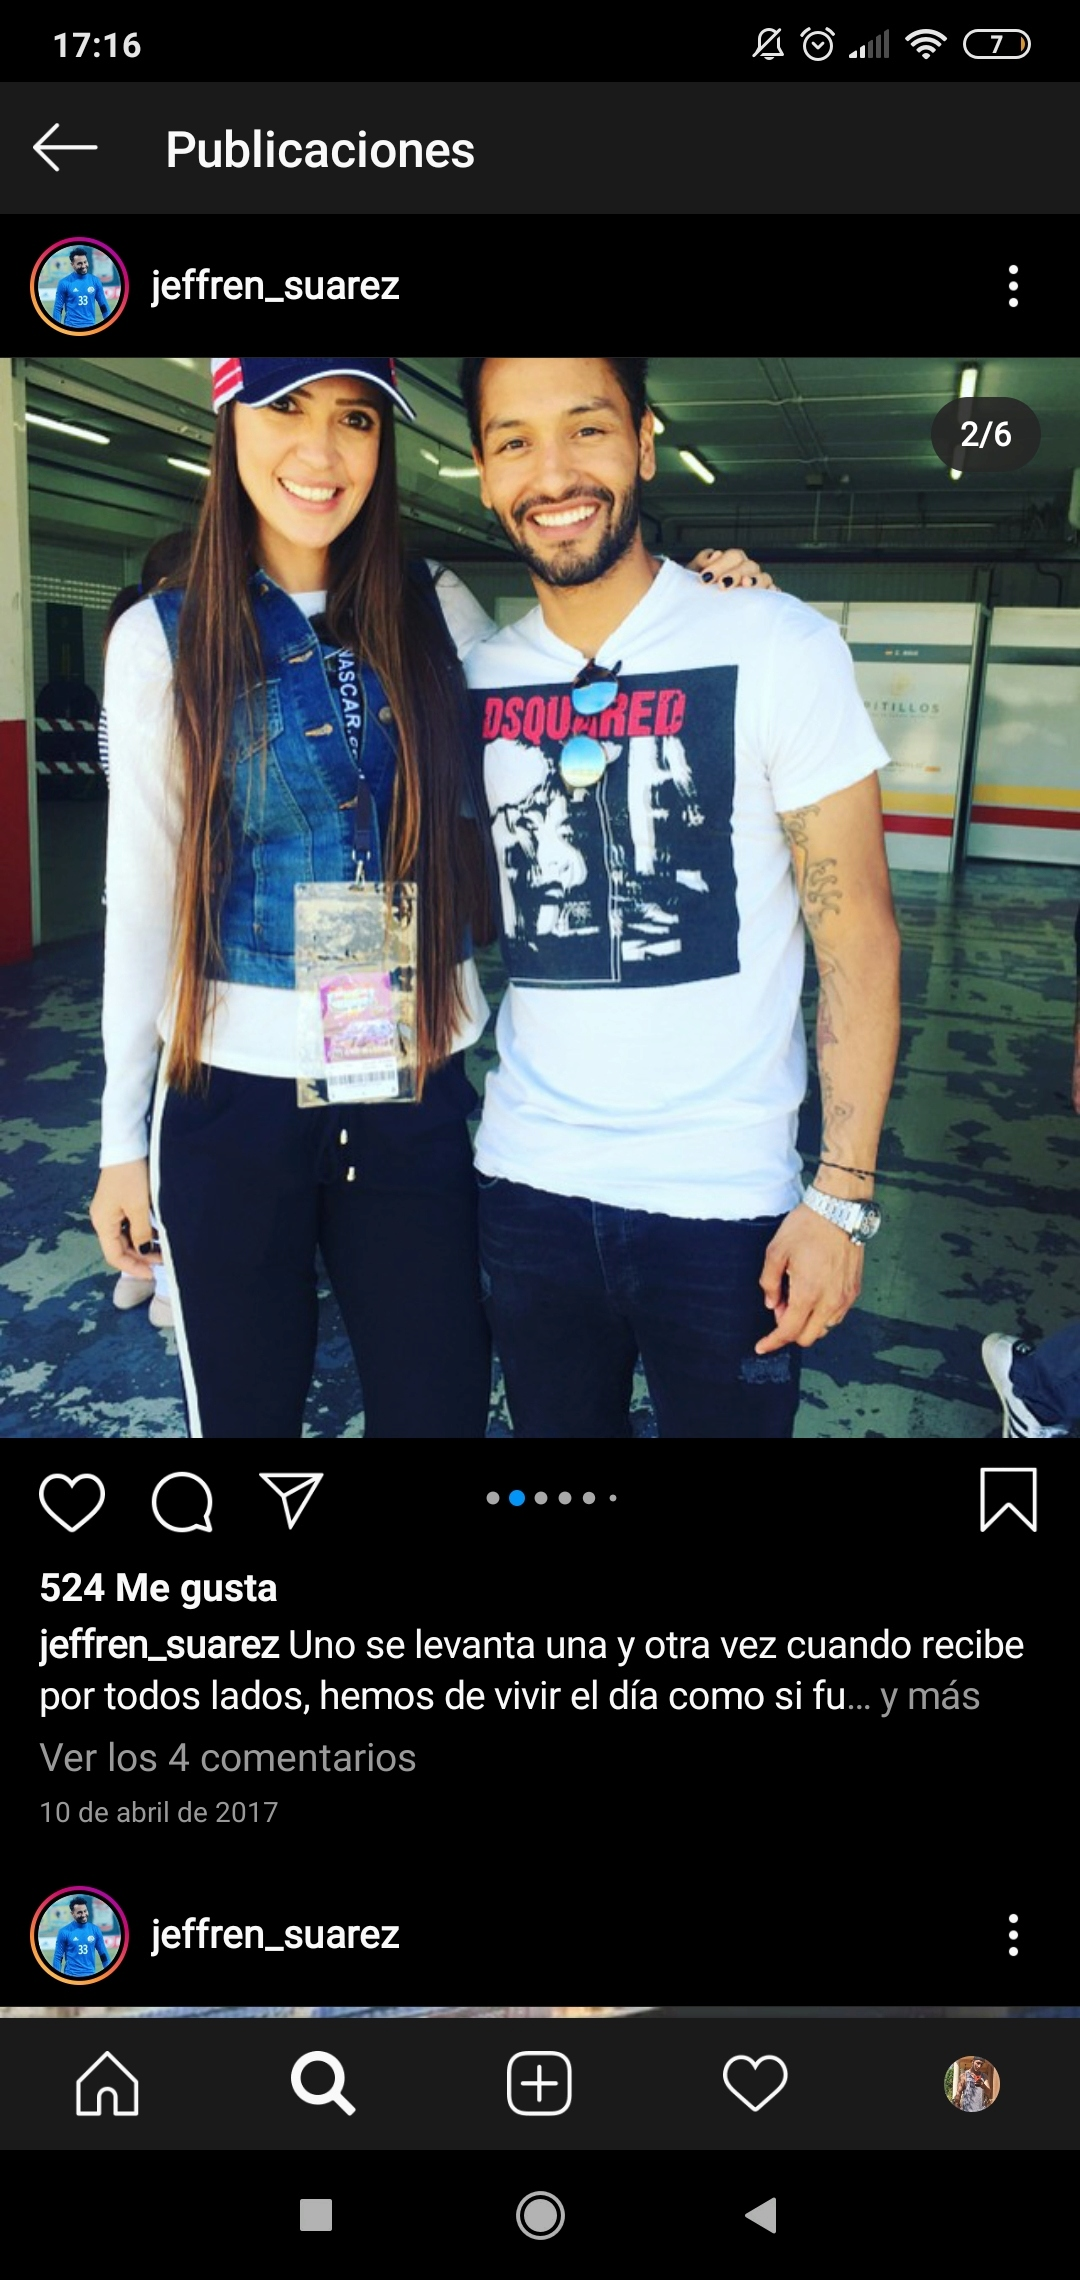 ¿Cuánto mide Jeffrén Suárez? Screen82